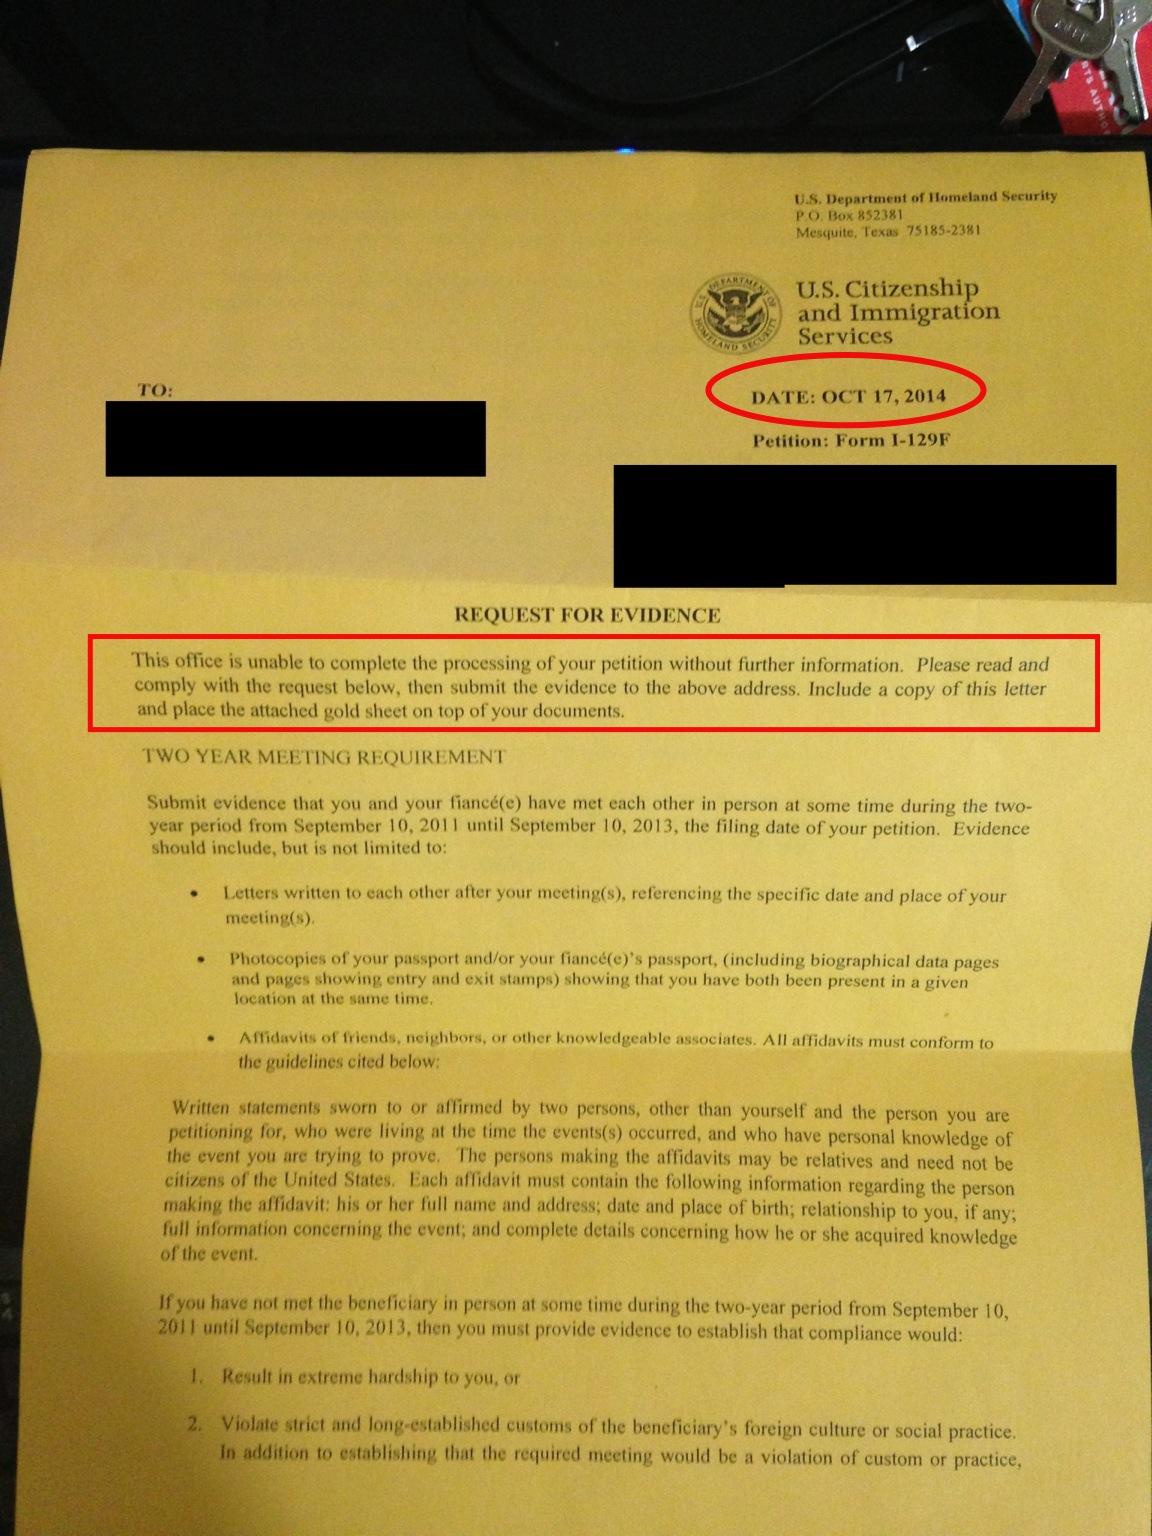 Send a box to uscis po box and rfe gold sheet k 1 fiancee visa post 168618 0 75154800 1386909164thumbg falaconquin